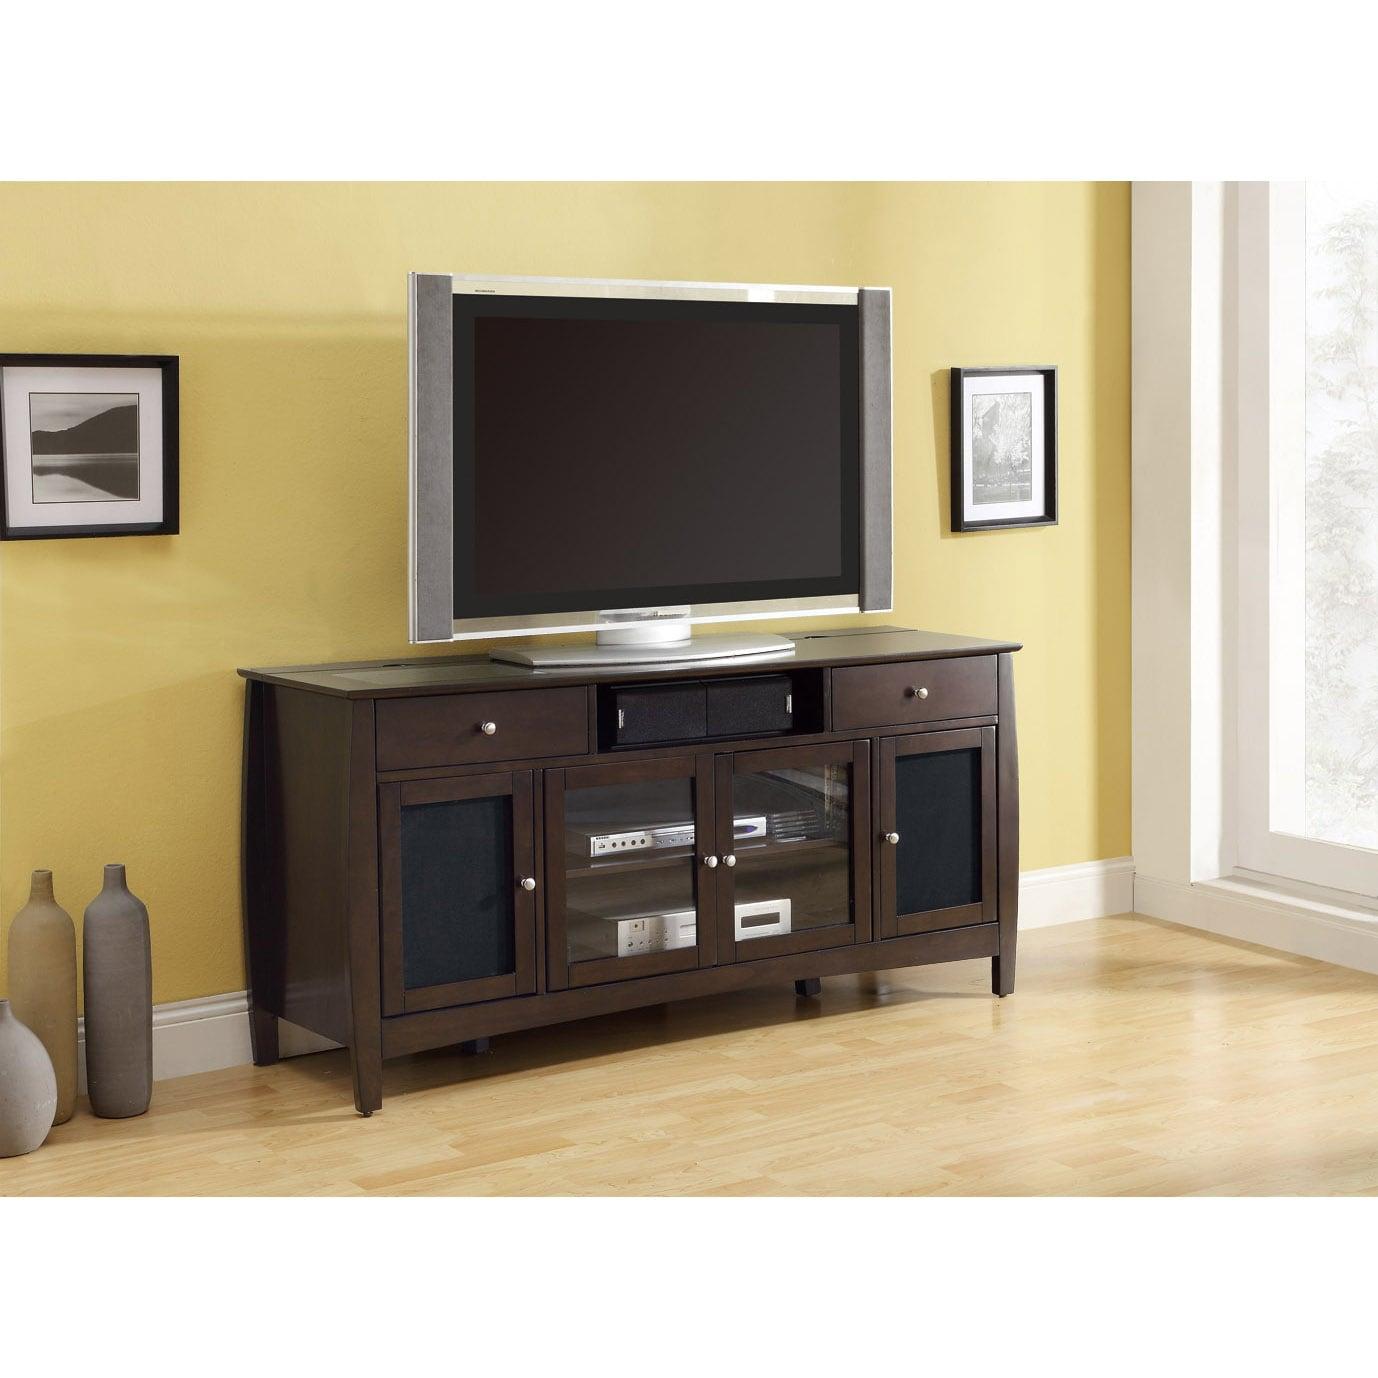 Dark Walnut Veneer Connect-it 64-inch TV Console